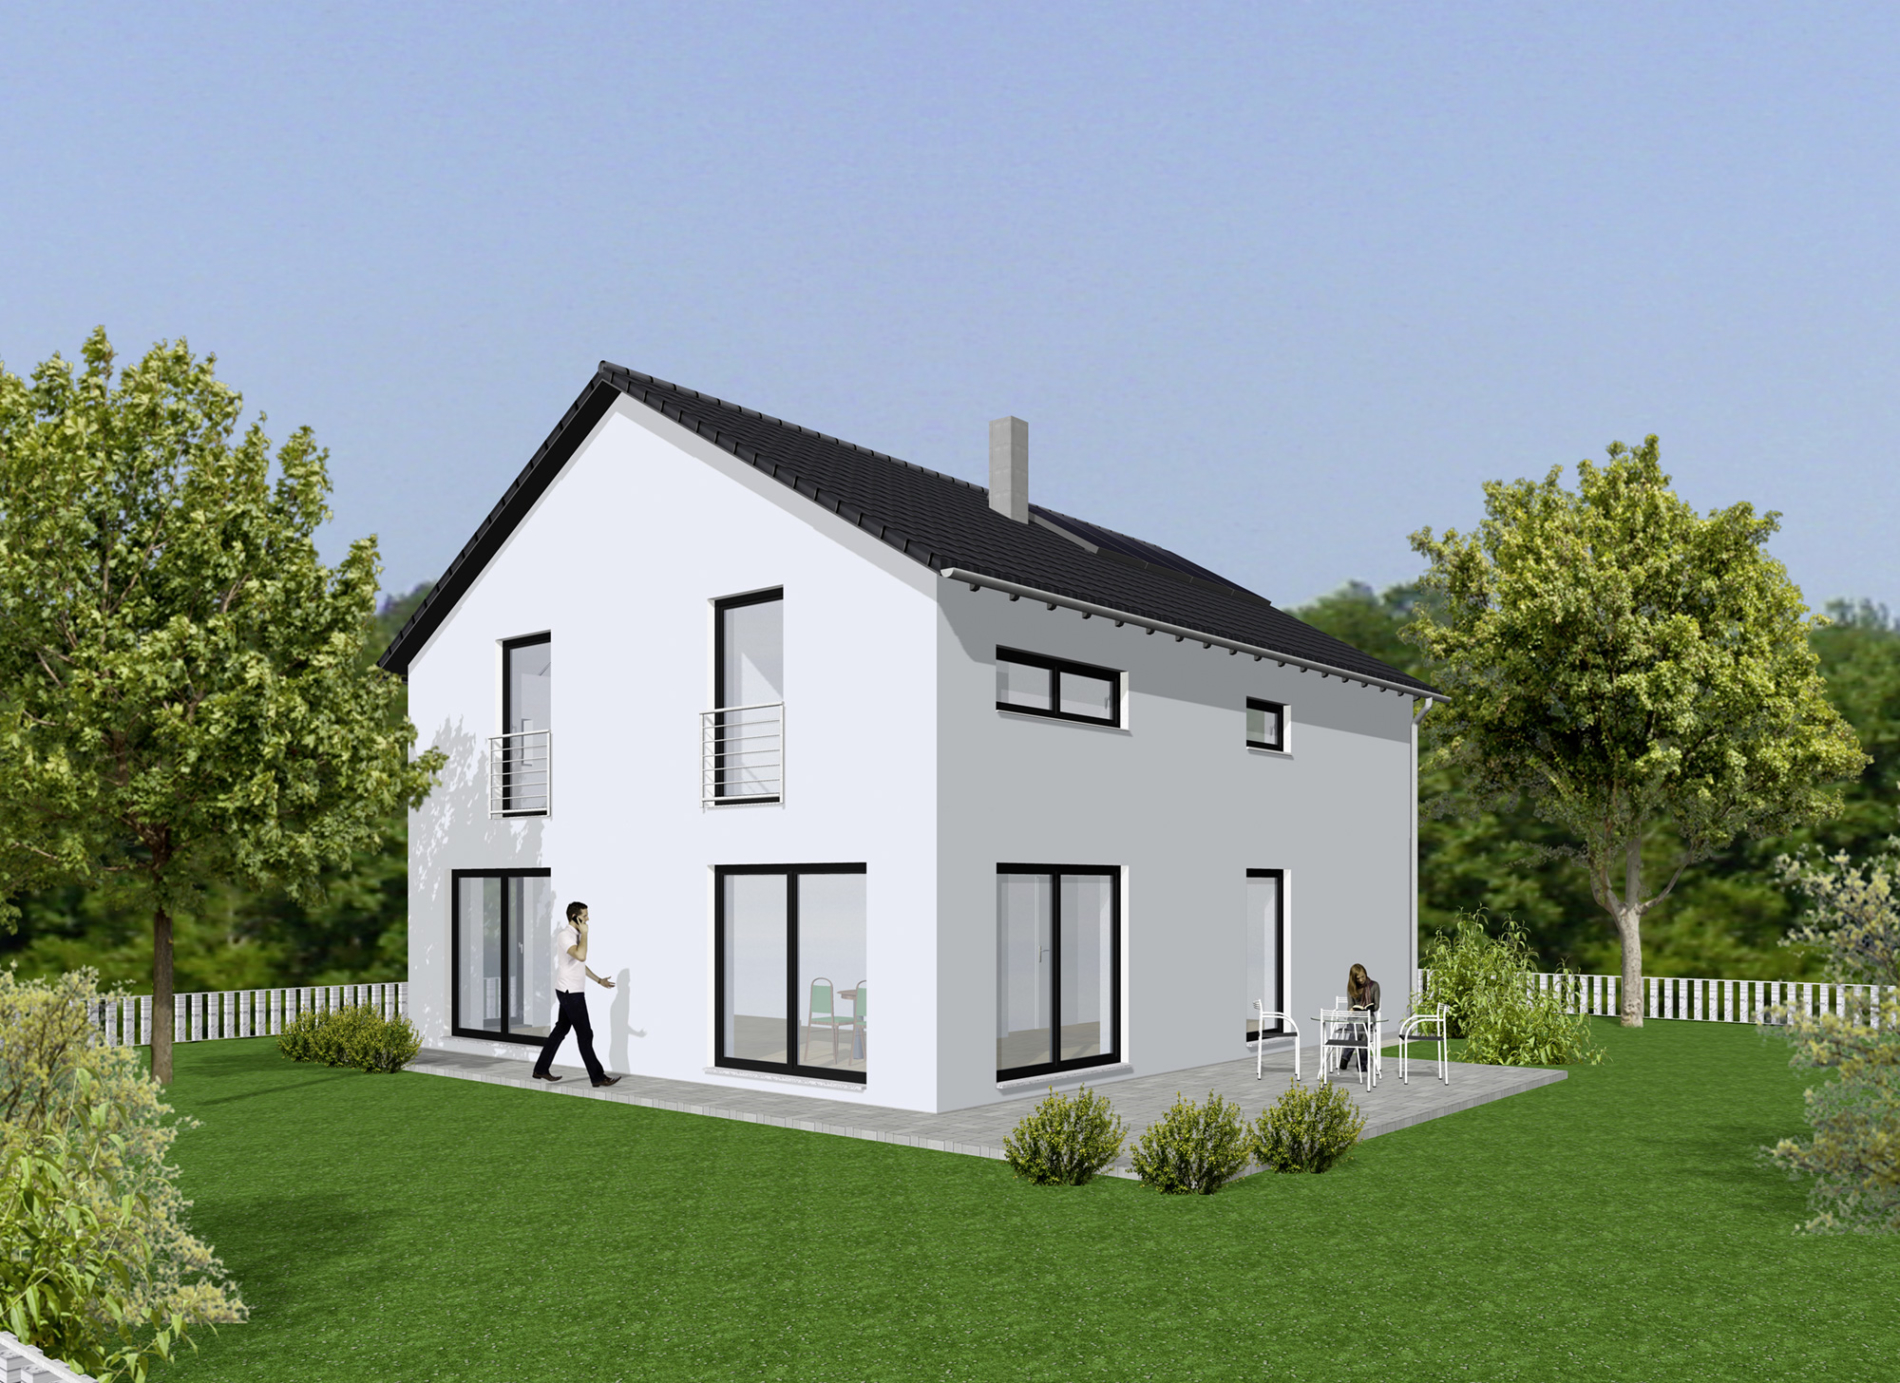 Haus Luca - Satteldach - bauen in Coburg